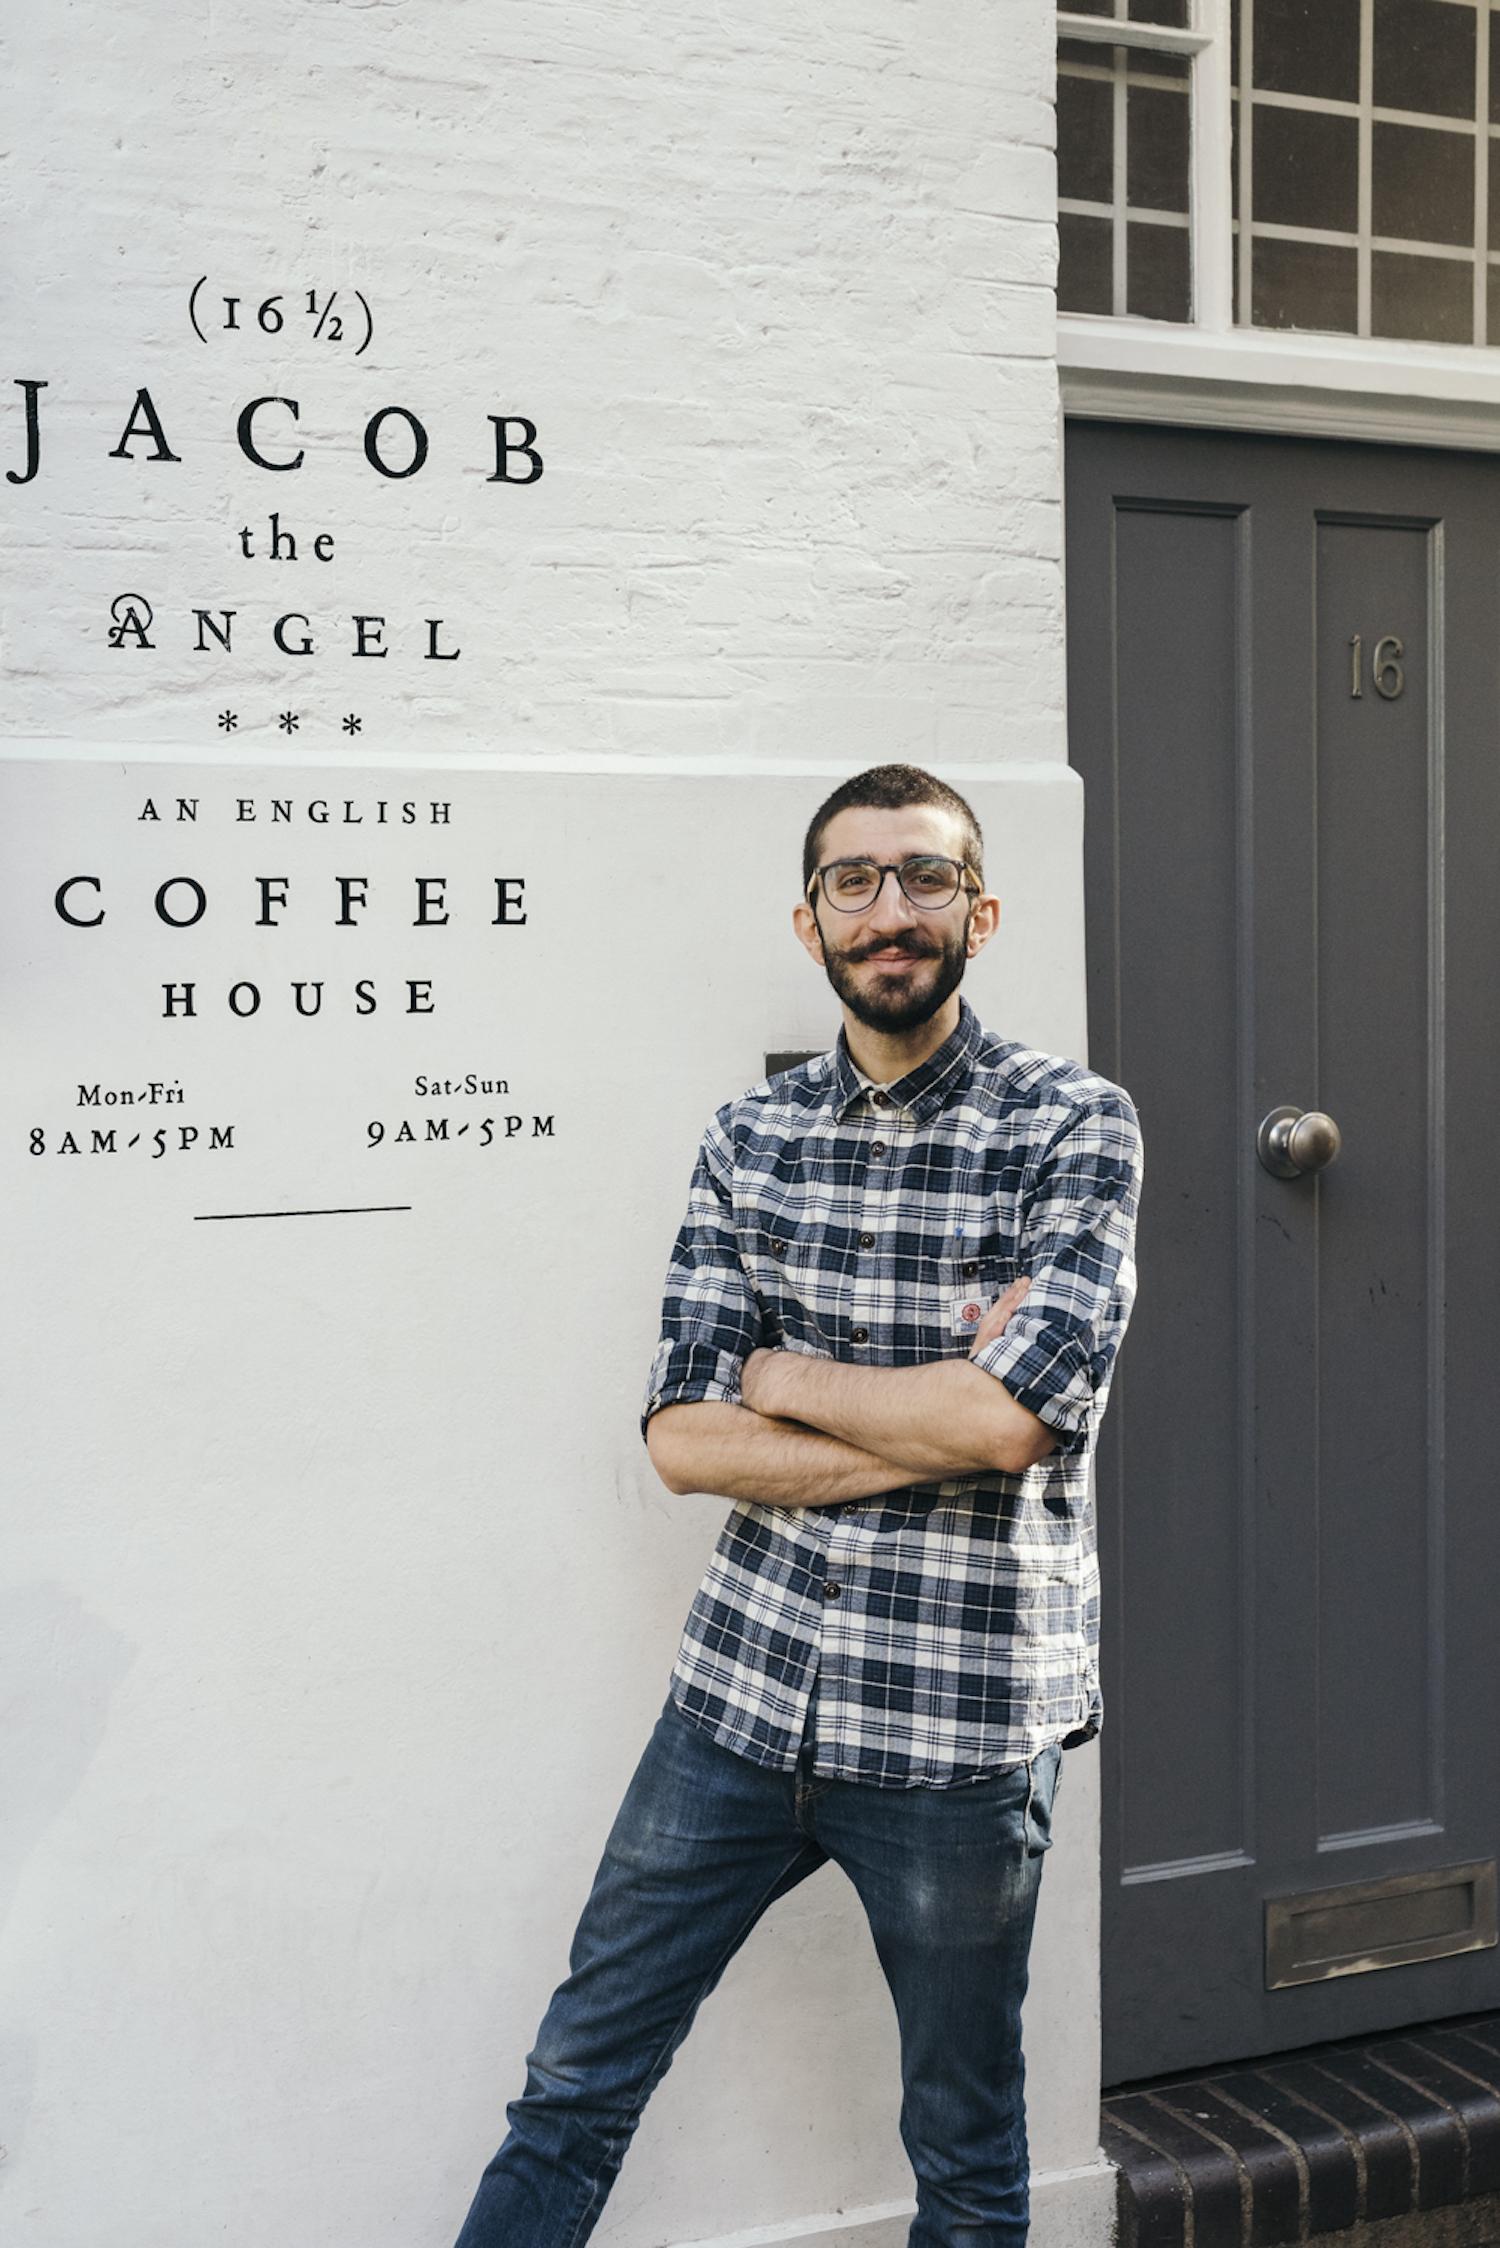 Jacob The Angel-0499.jpg